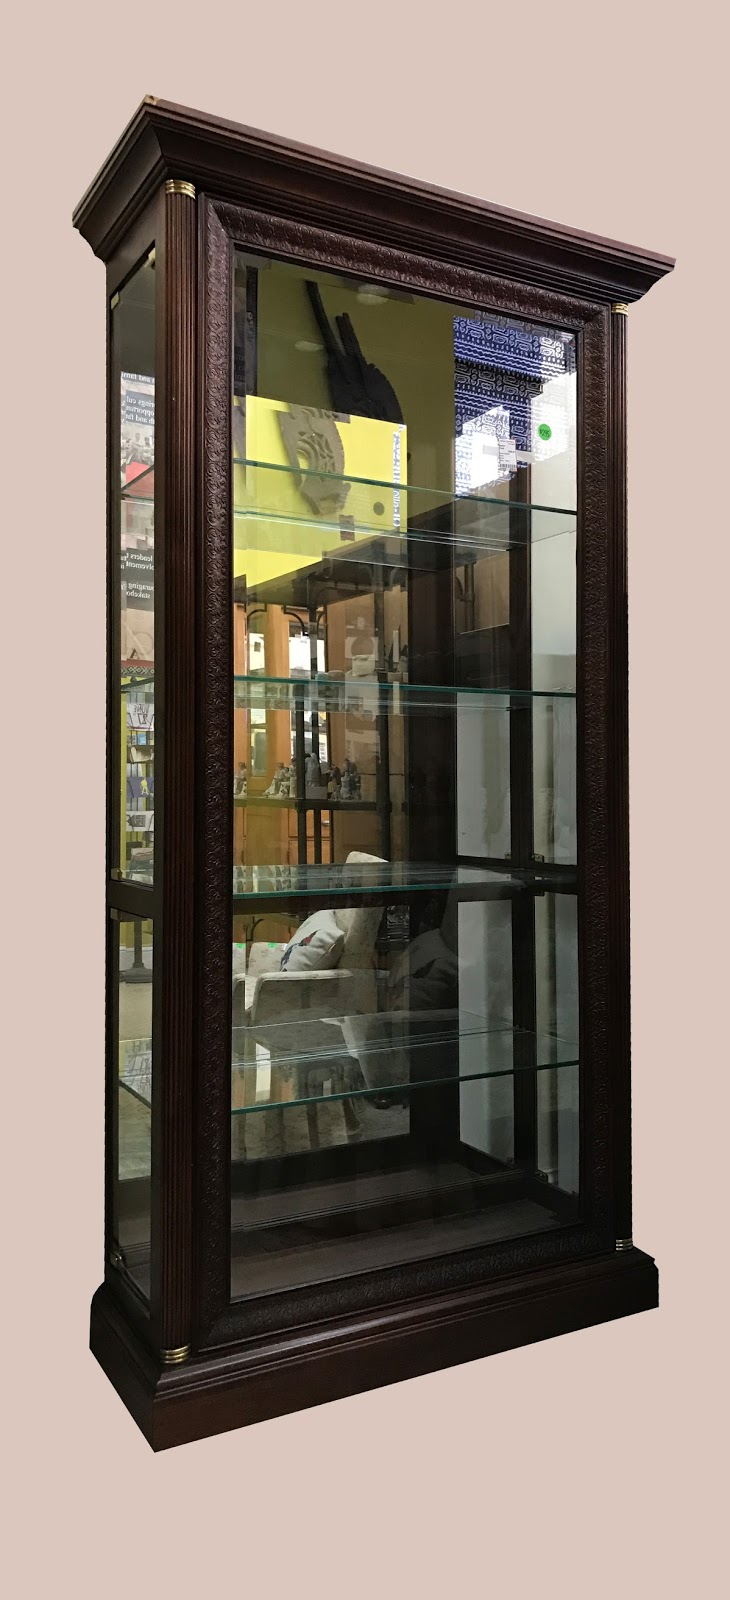 Uhuru Furniture & Collectibles: Large Lighted Curio